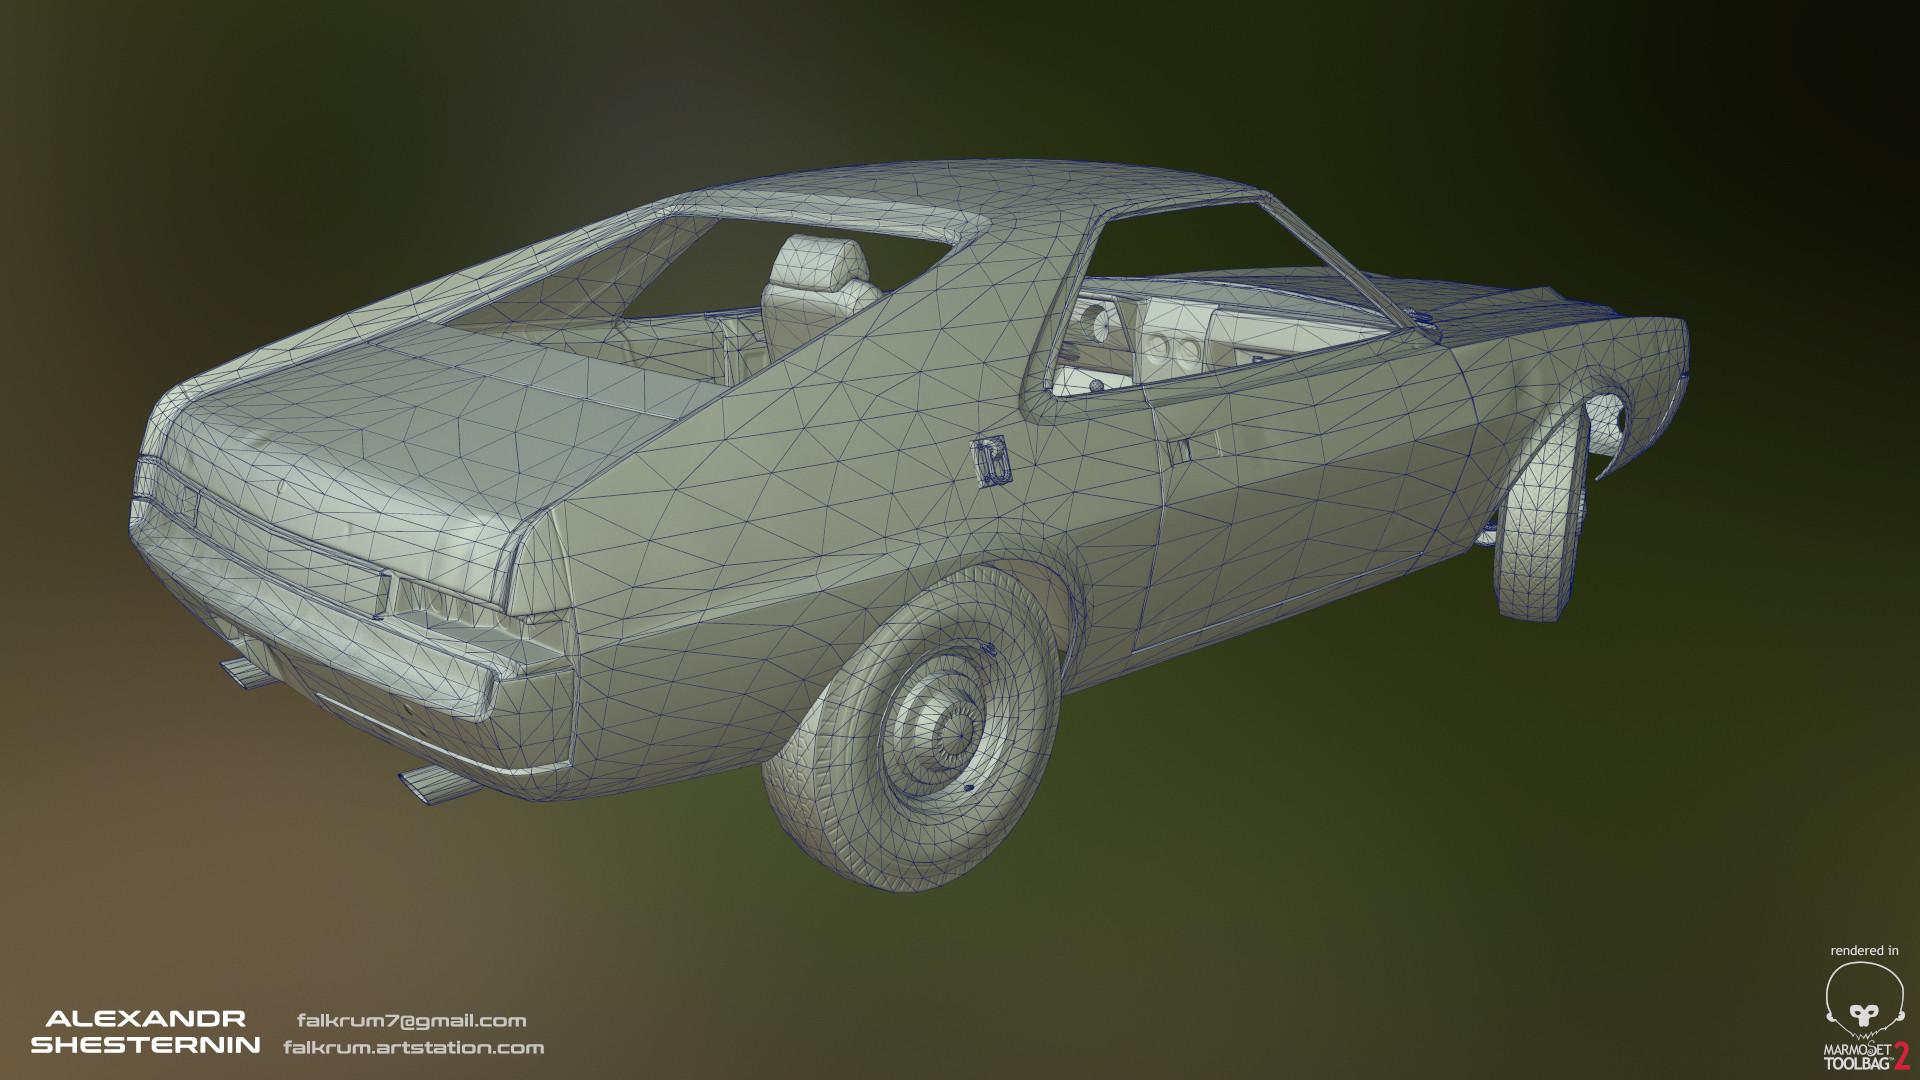 Alexandr shesternin modular abandoned car12